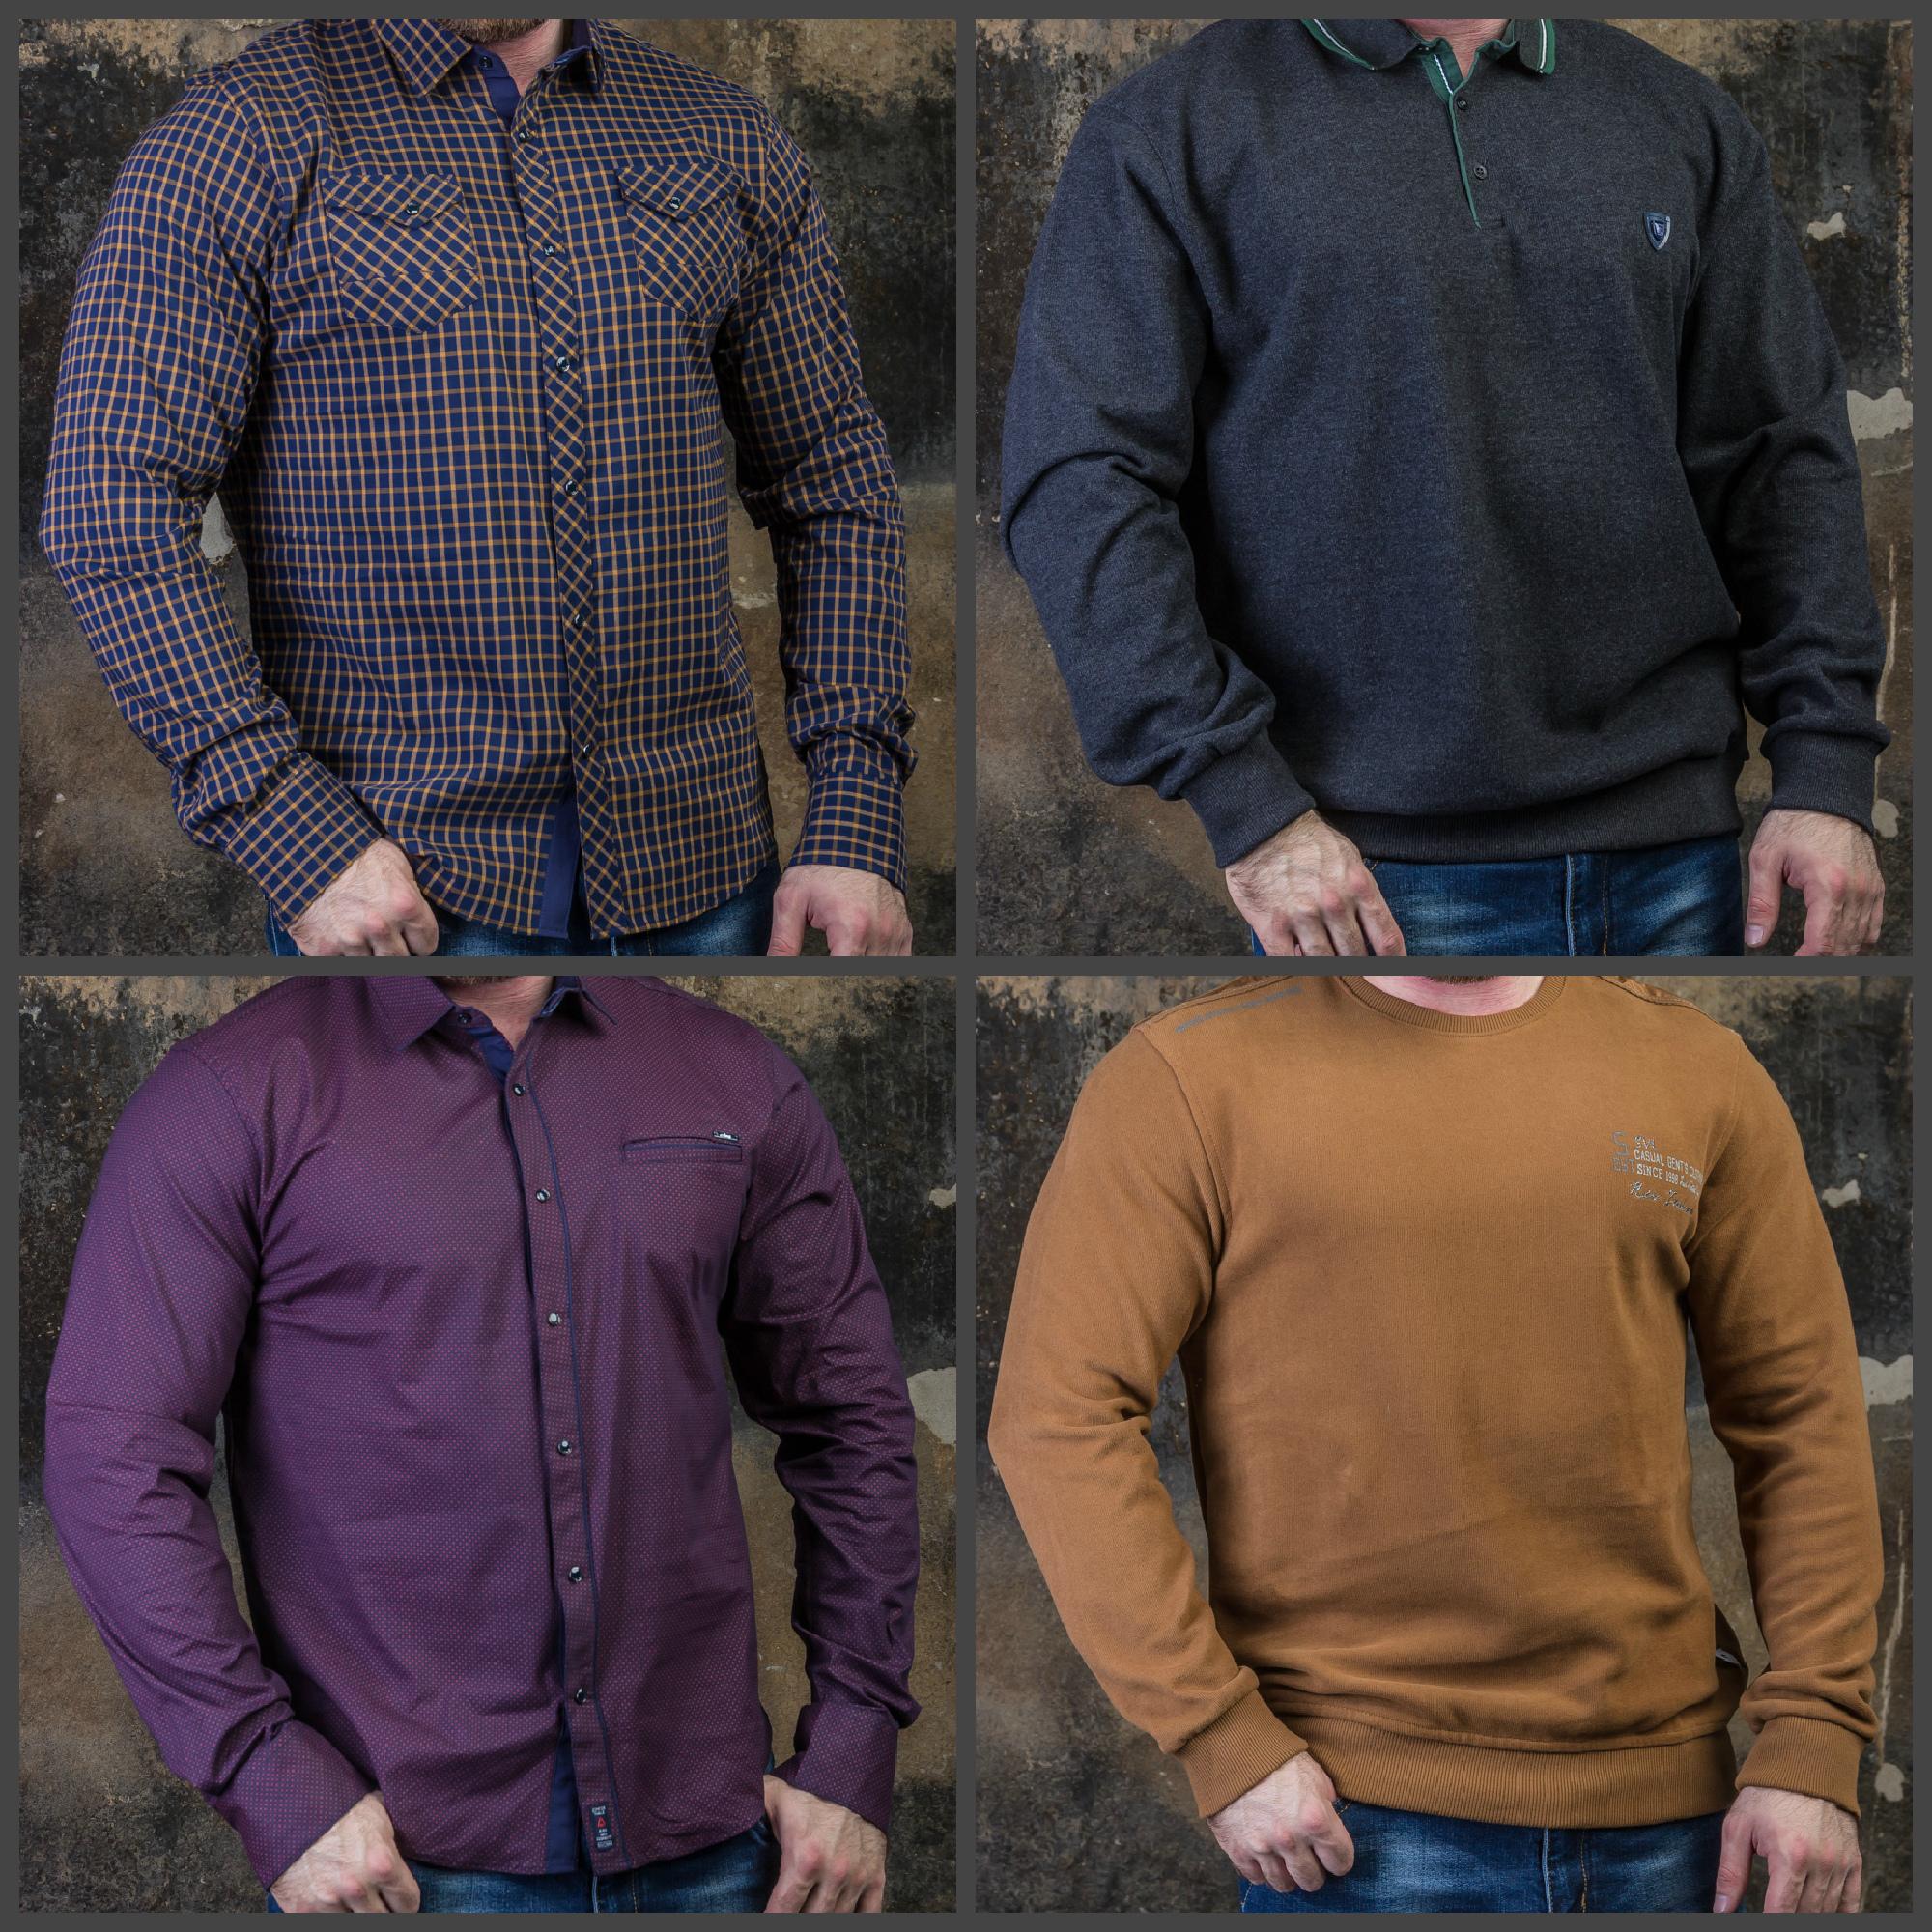 Новинки: толстовки, рубашки, джемпера (размеры 56-62)